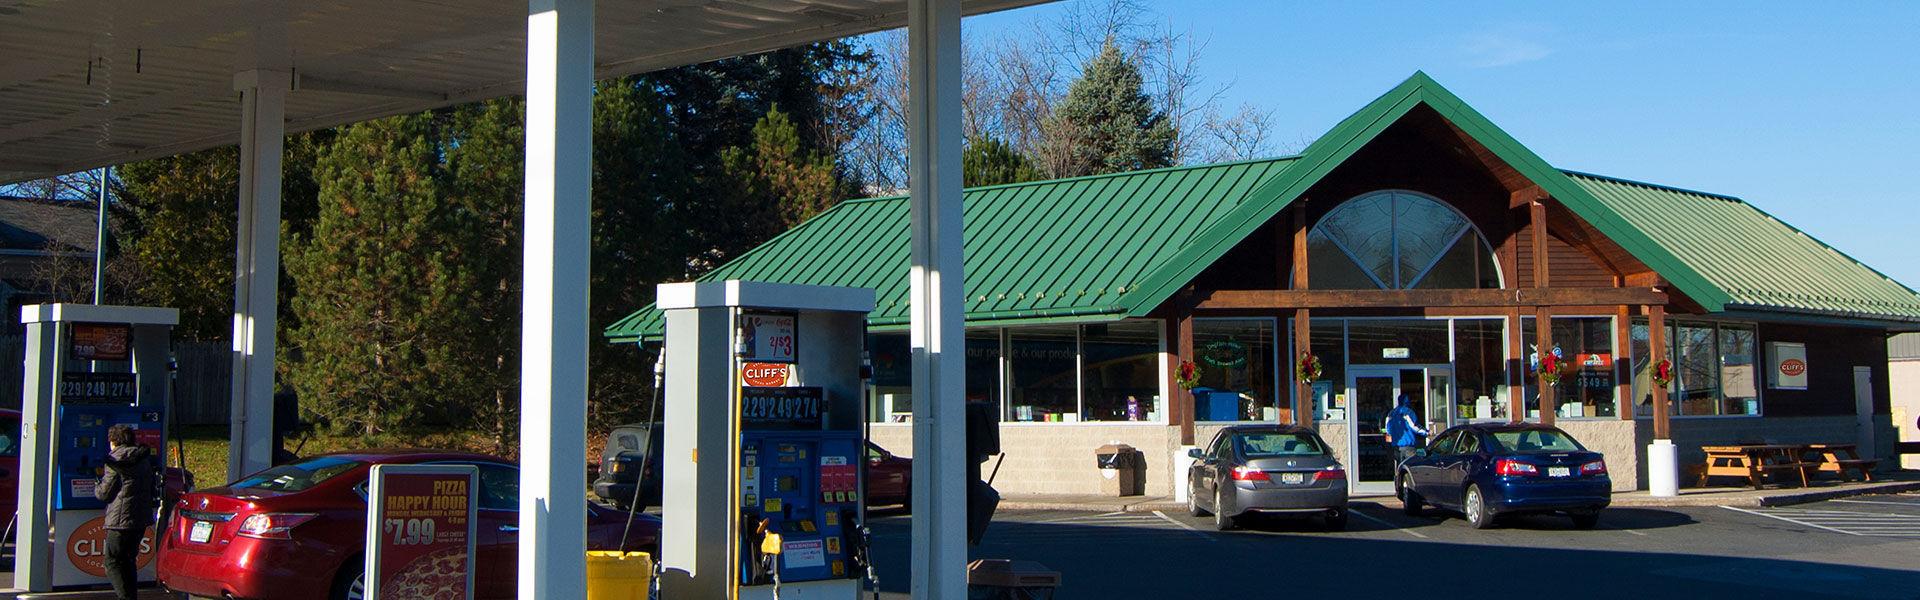 Cliff's Local Market Kirkland